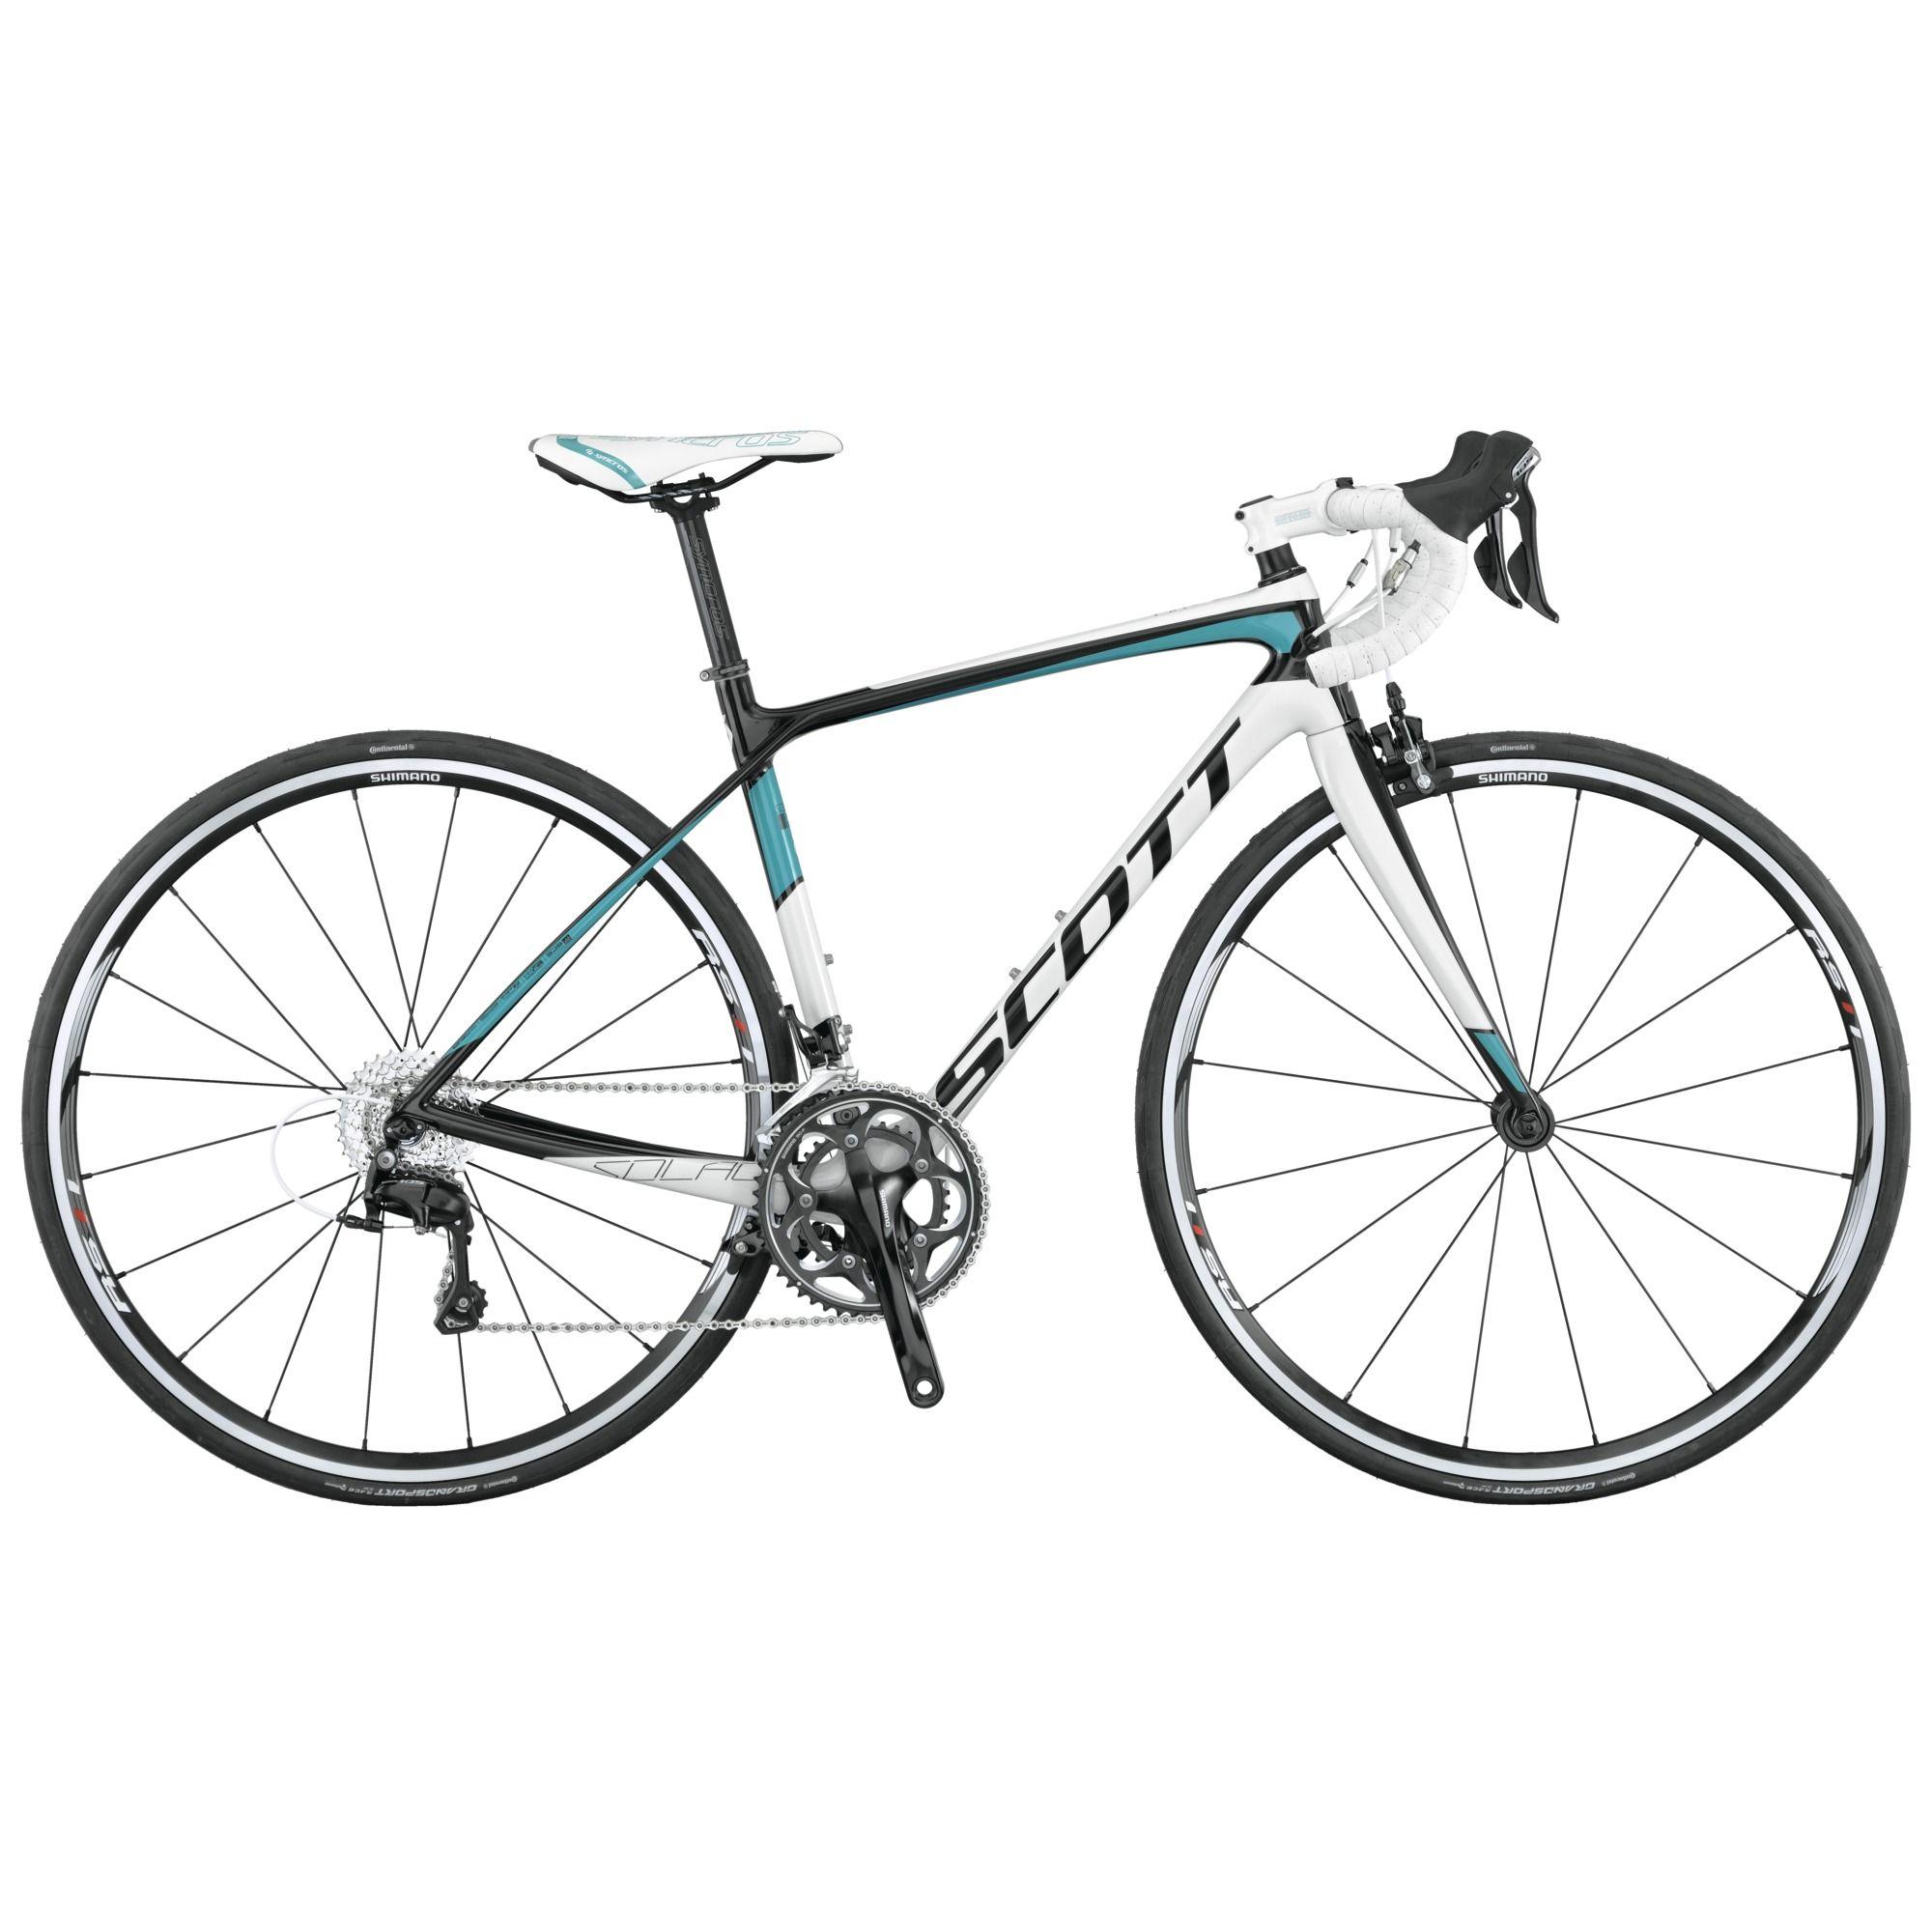 Scott Sports Scott Contessa Solace 25 Bike Beach Bicycle Bike